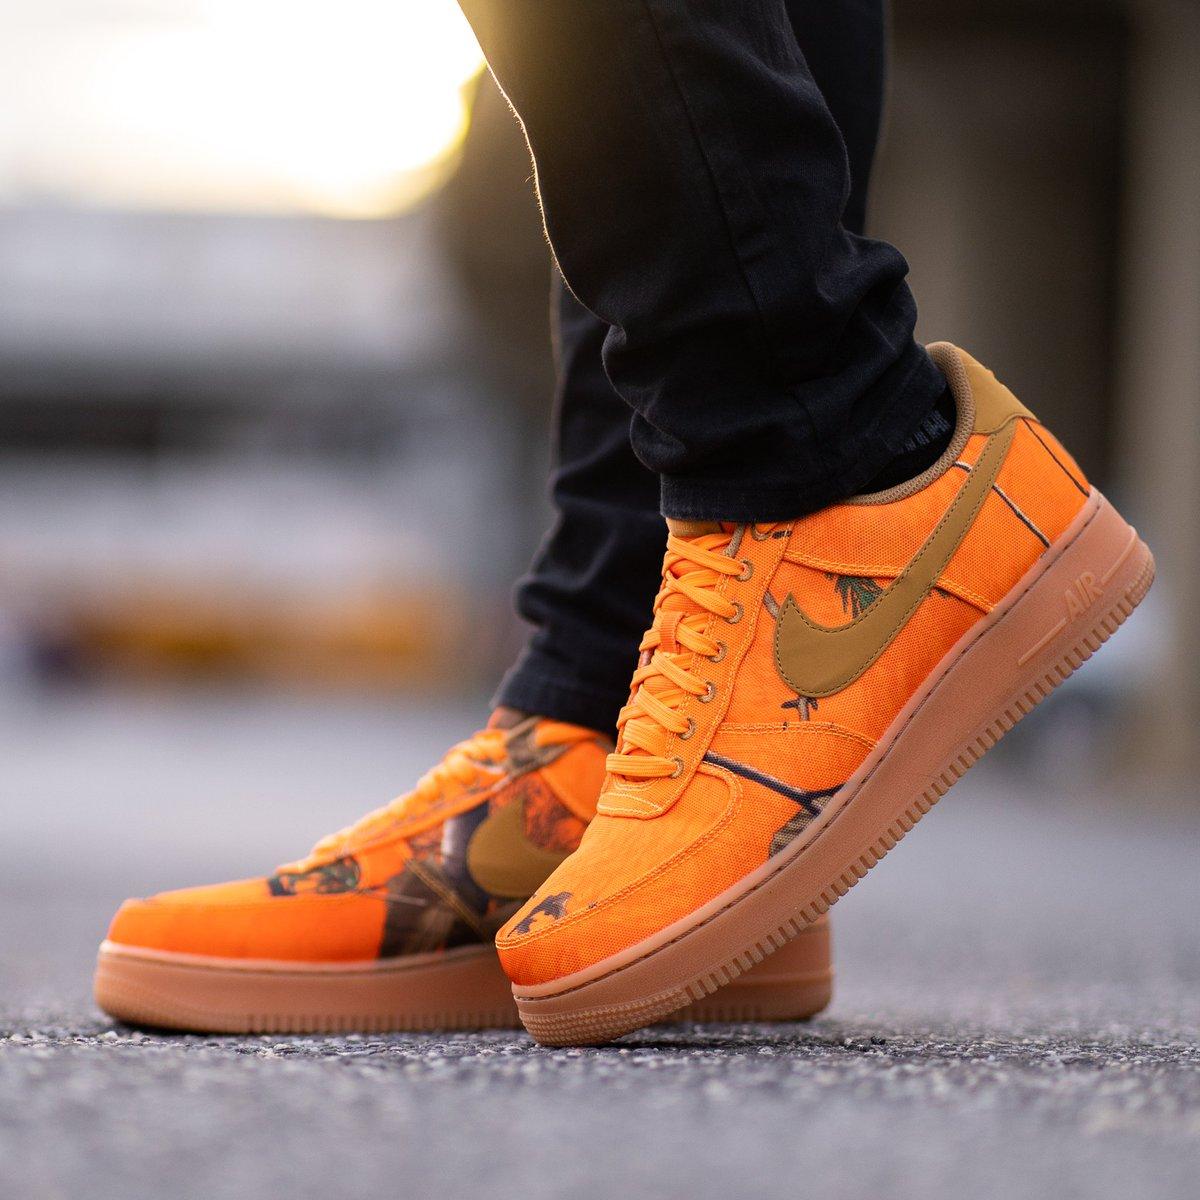 a726a5bd26a7b GB'S Sneaker Shop on Twitter: